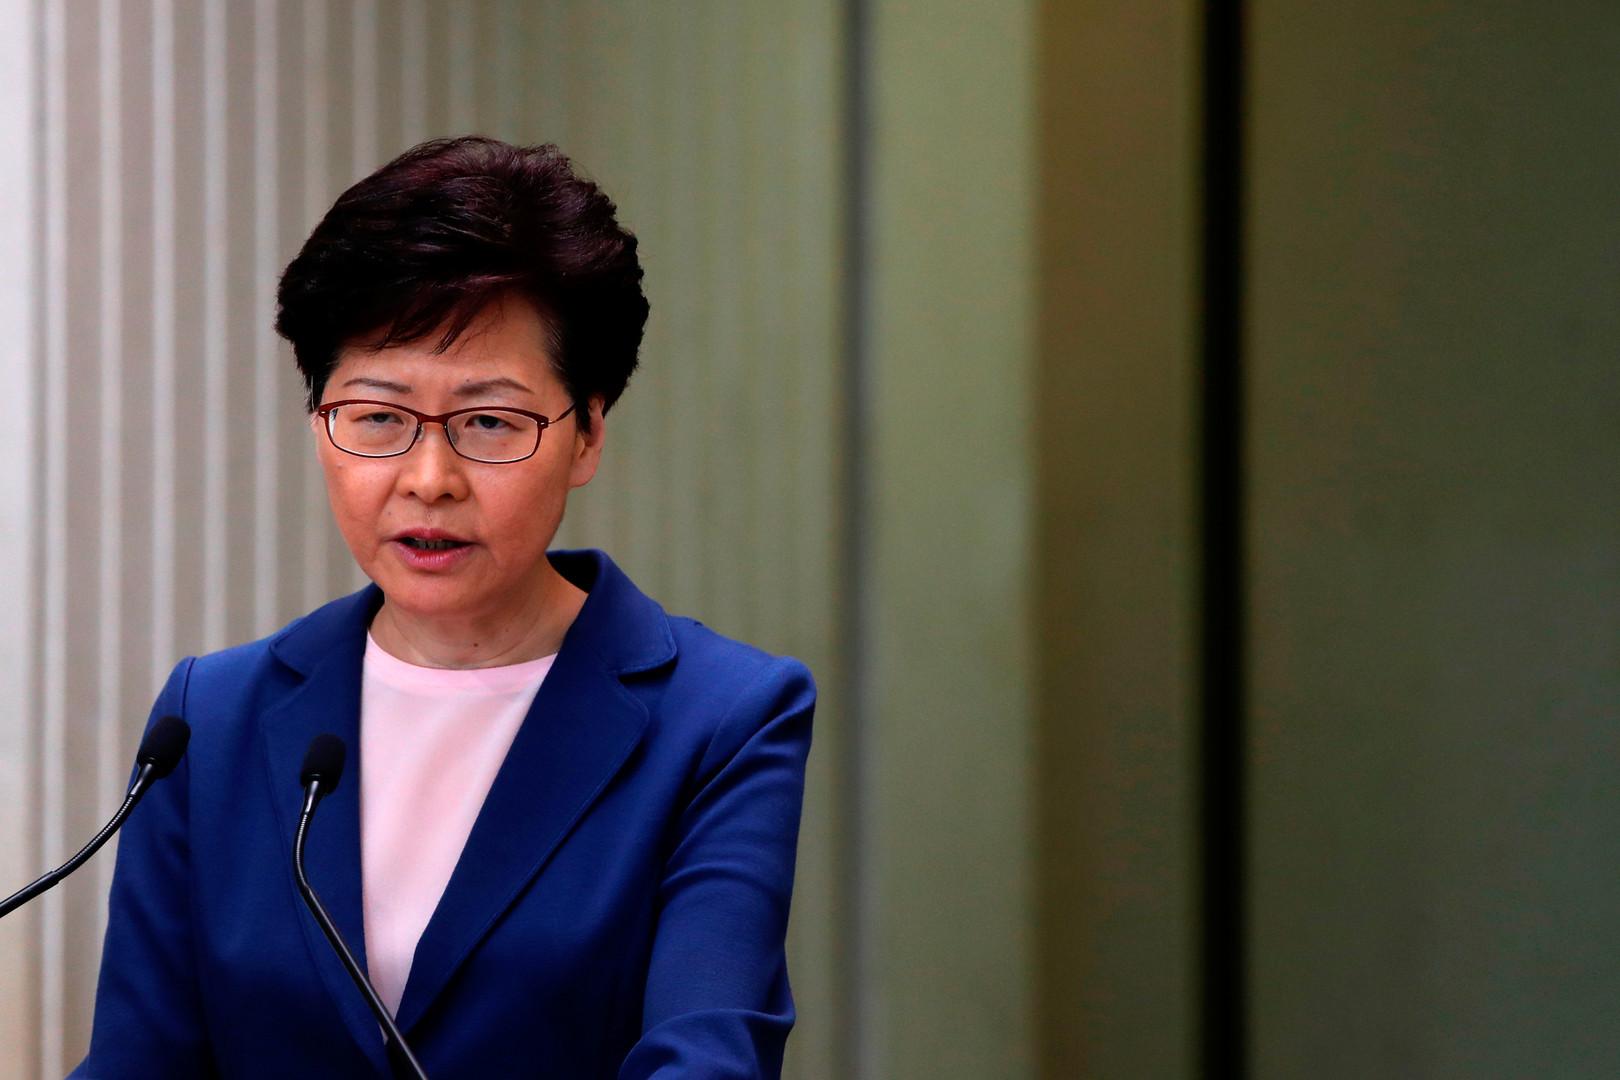 رئيسة حكومة هونغ كونغ، كاري لام